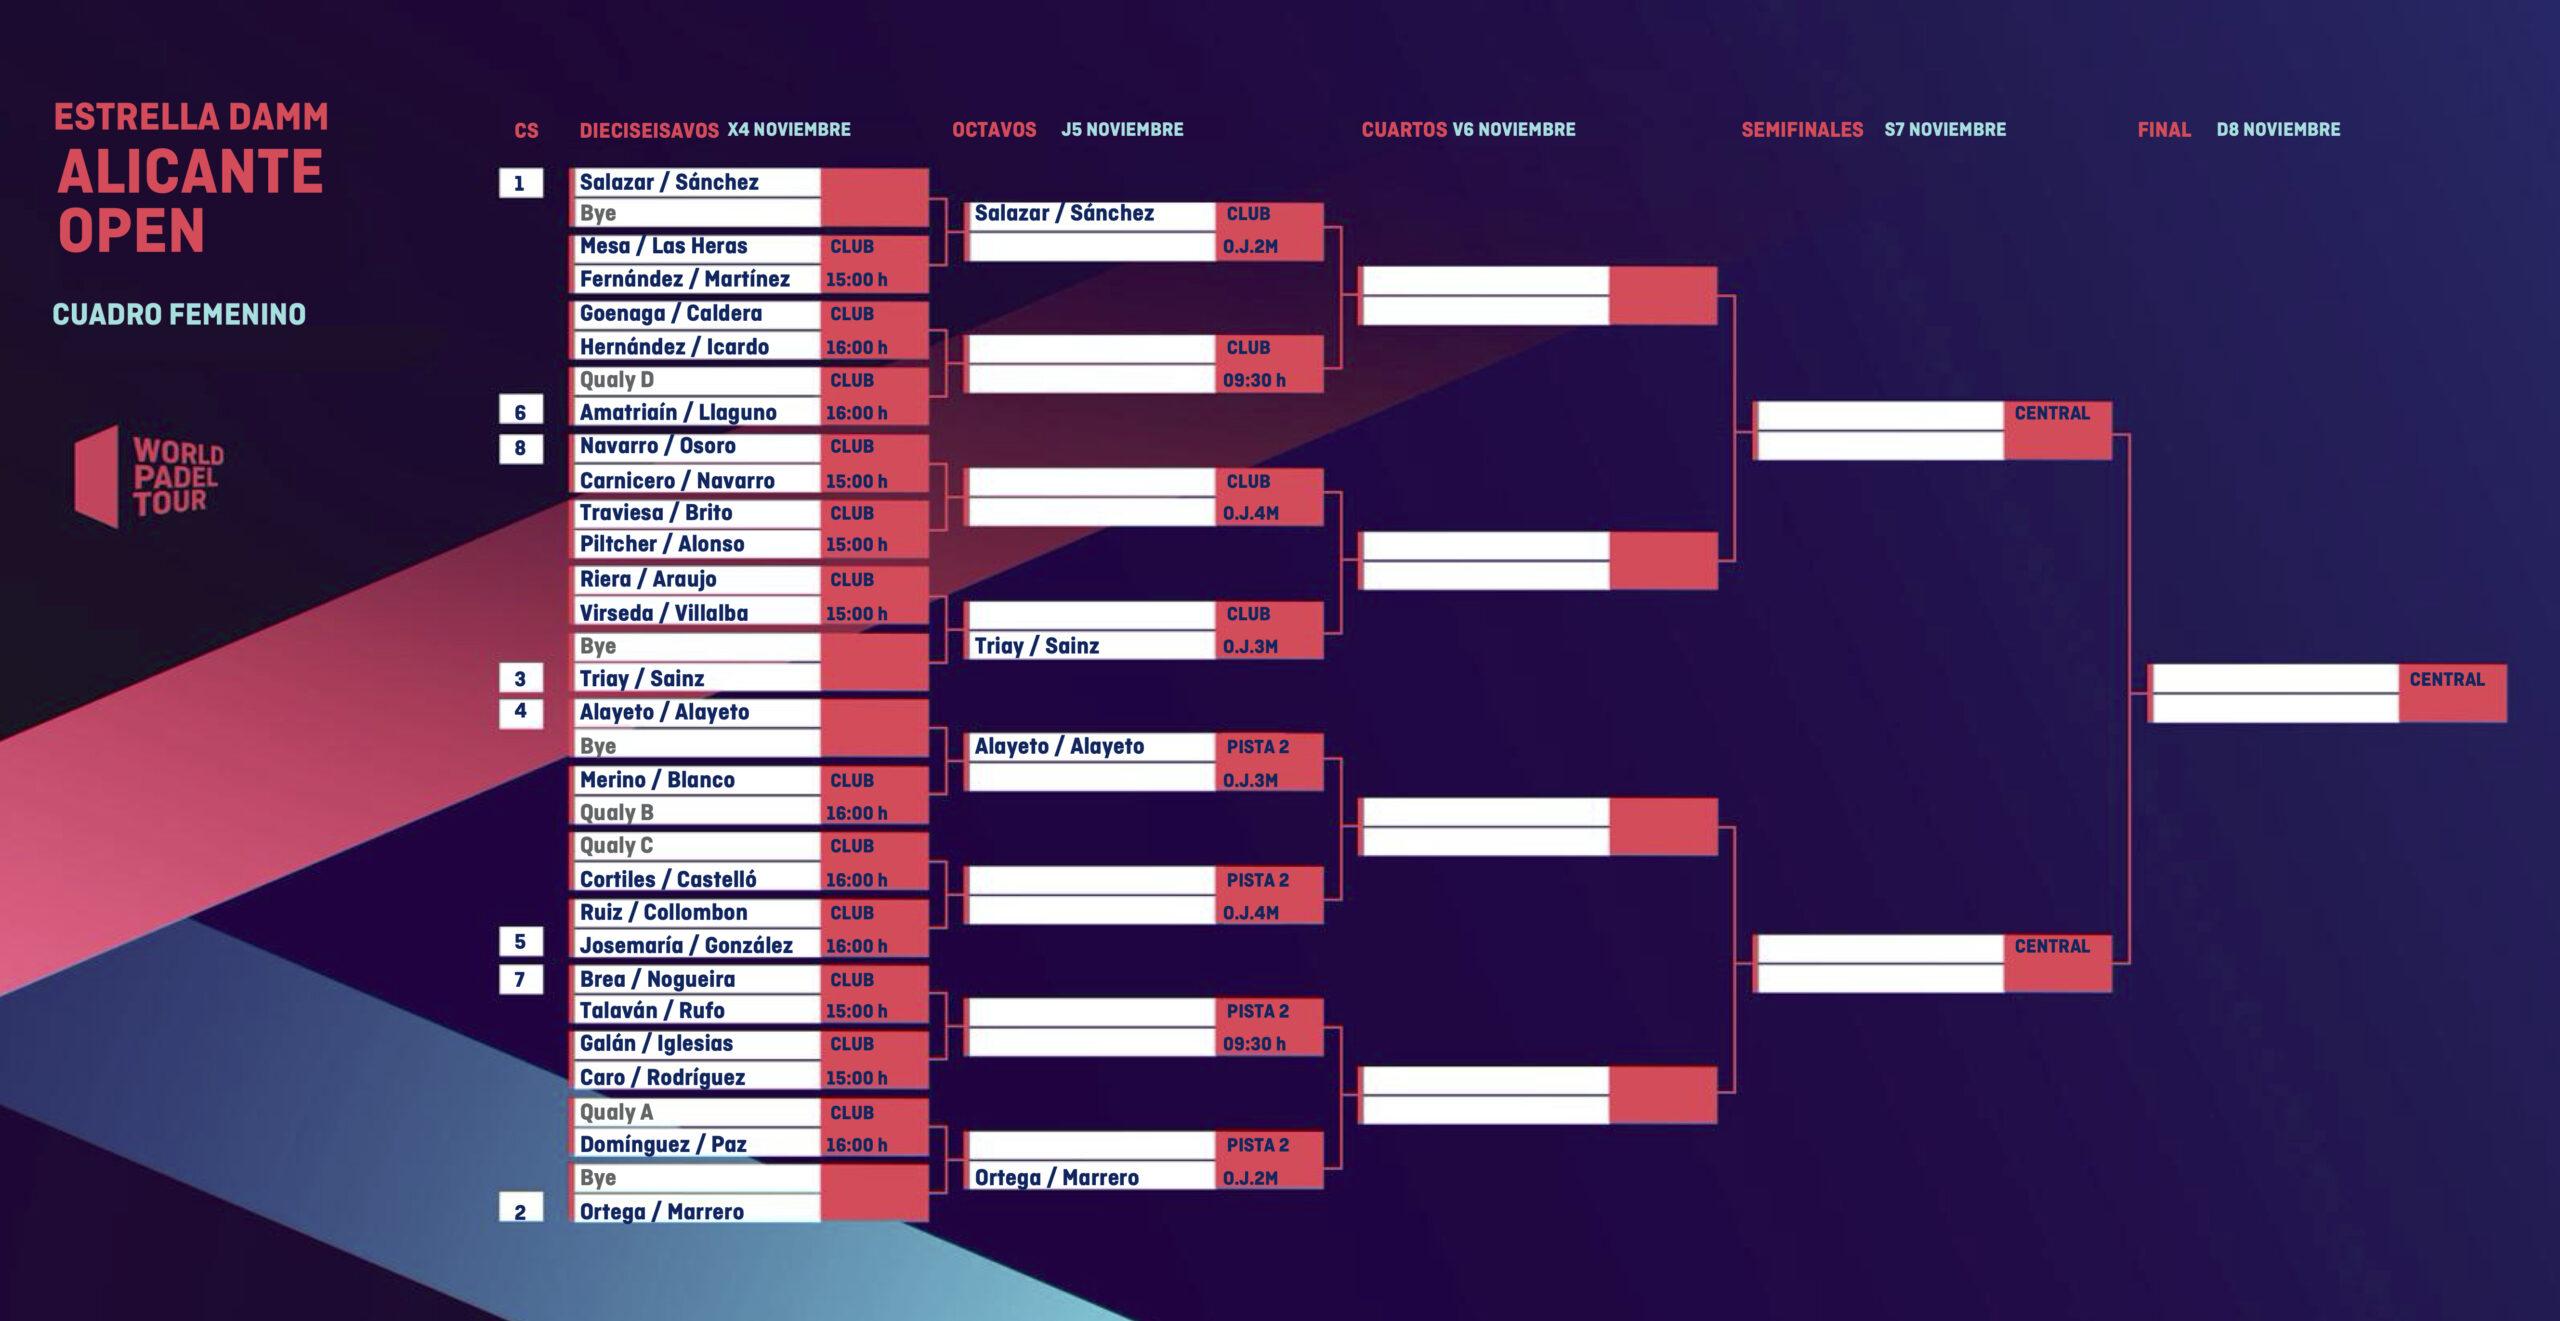 Cuadro final femenino del Alicante Open